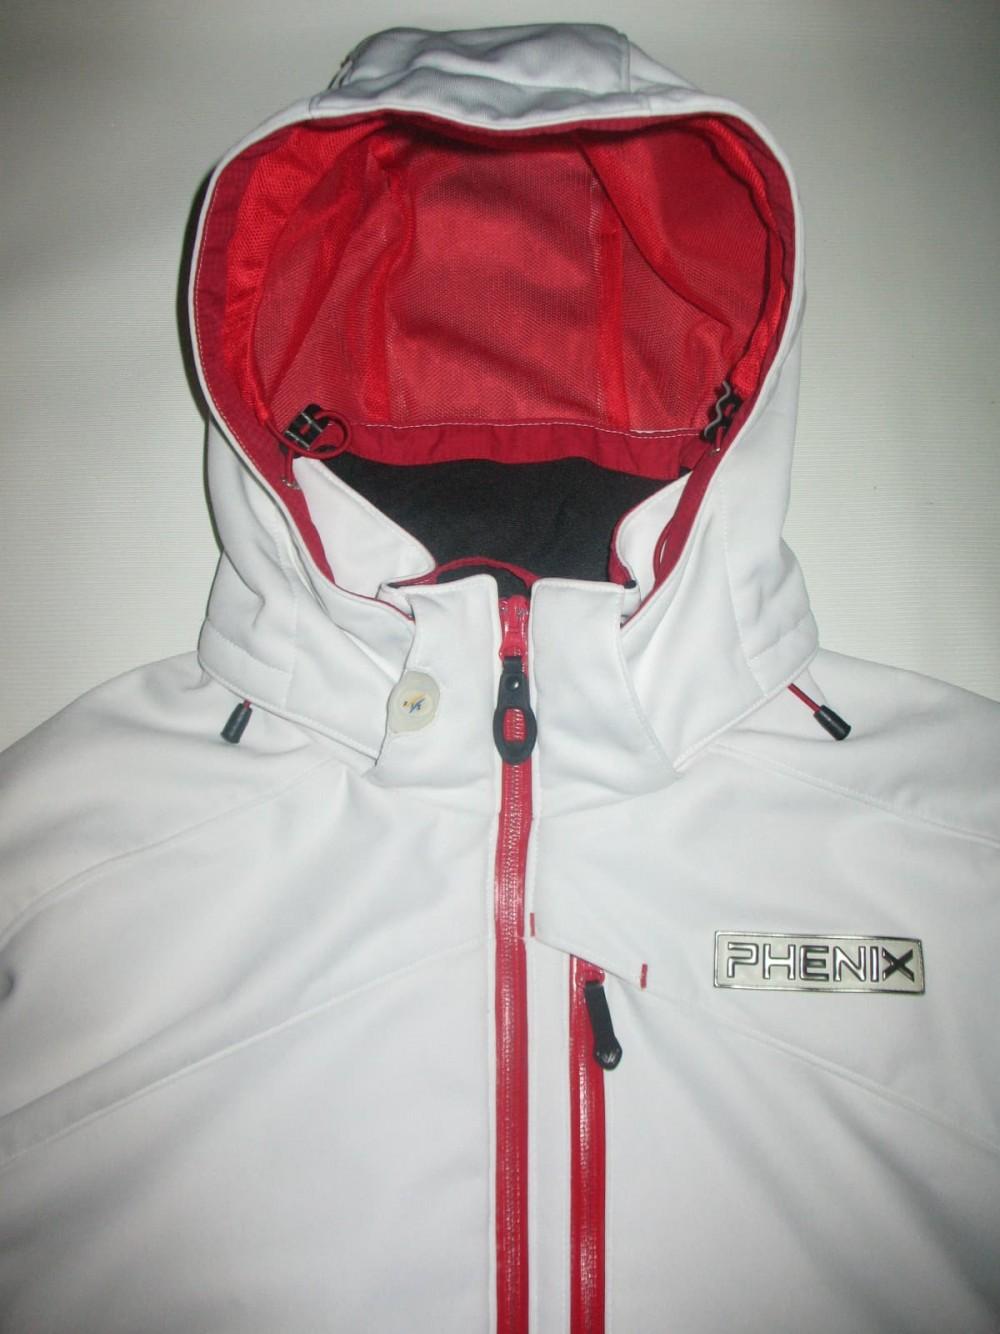 Куртка PHENIX f.i.s. softshell jacket (размер XL) - 2